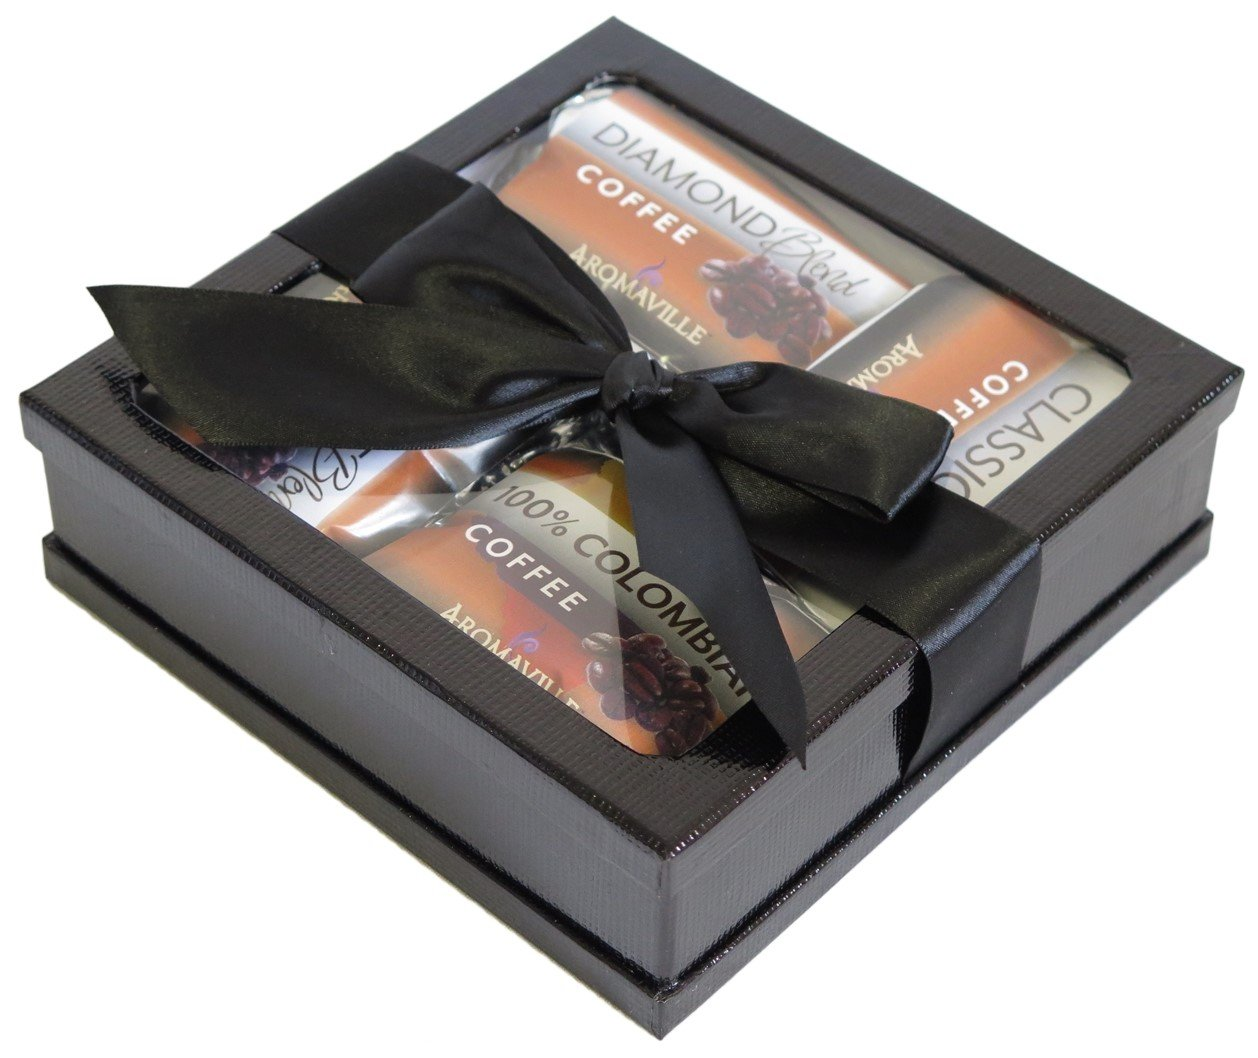 Gourmet Coffee Gift Set - Coffee Gift Basket - Coffee Lovers Gifts - Coffee Gift Set - Best Coffee Gift (Black)